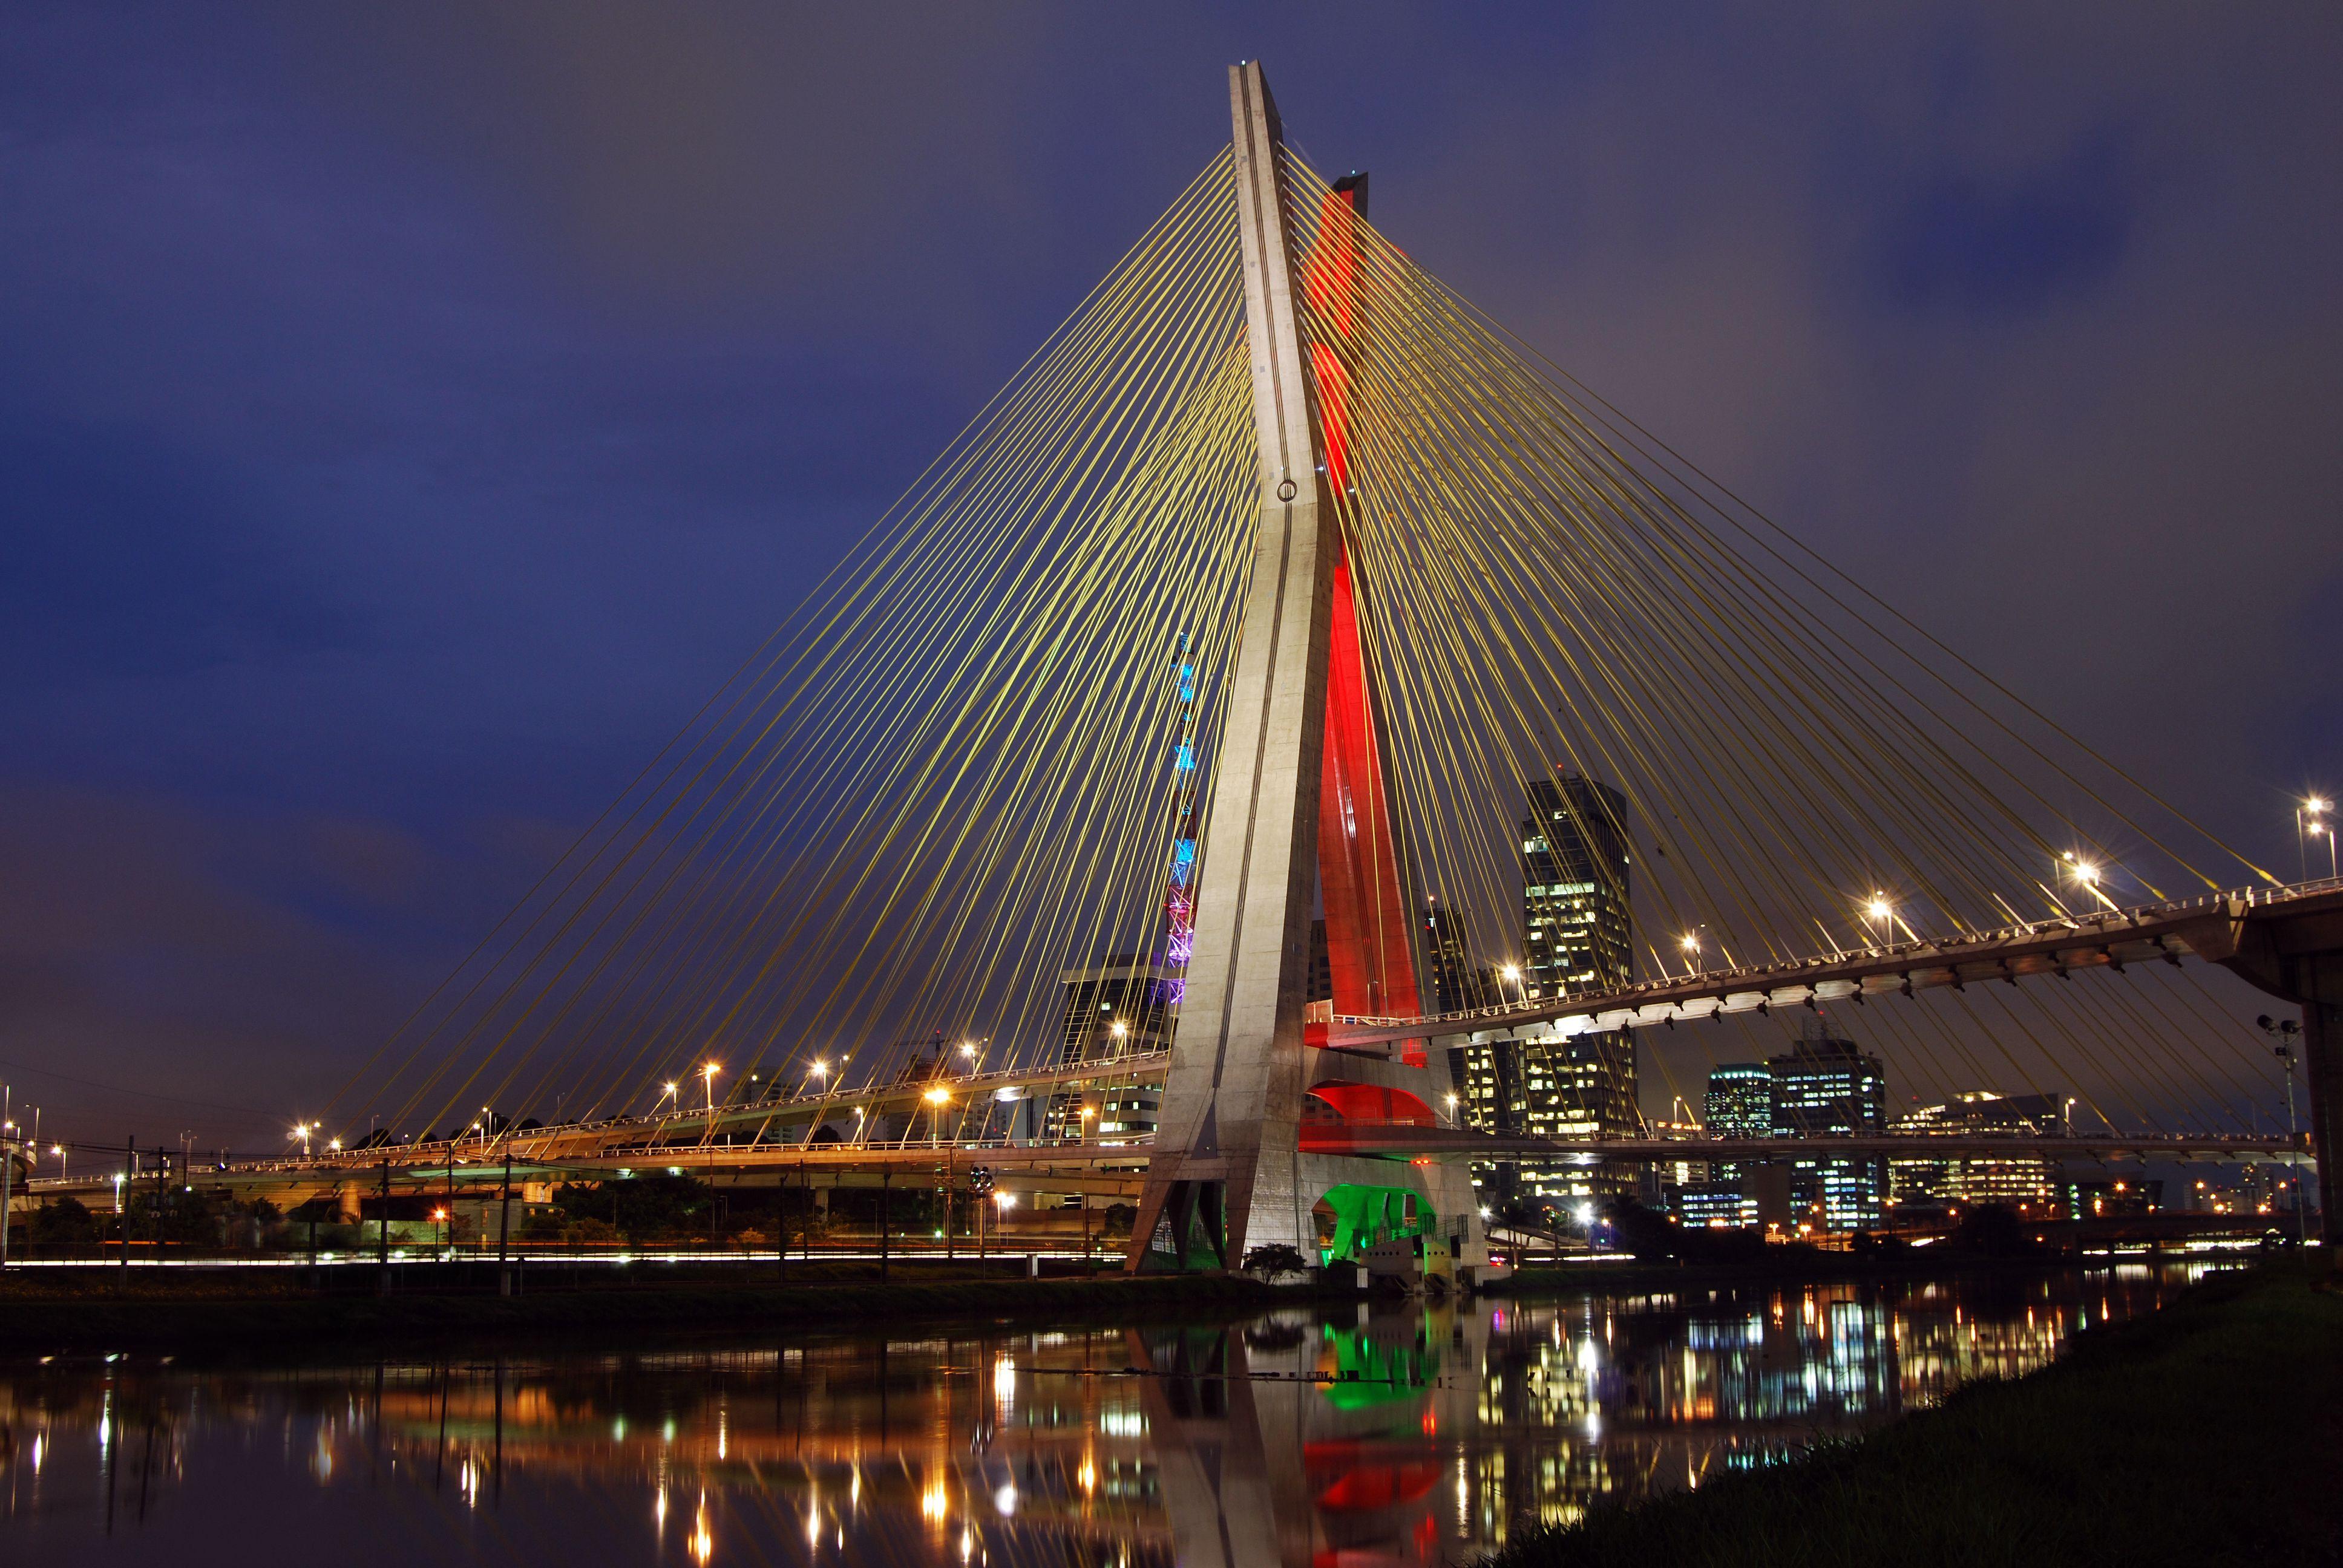 Ponte Estaiada Octavio Frias de Oliveira in Sao Paulo